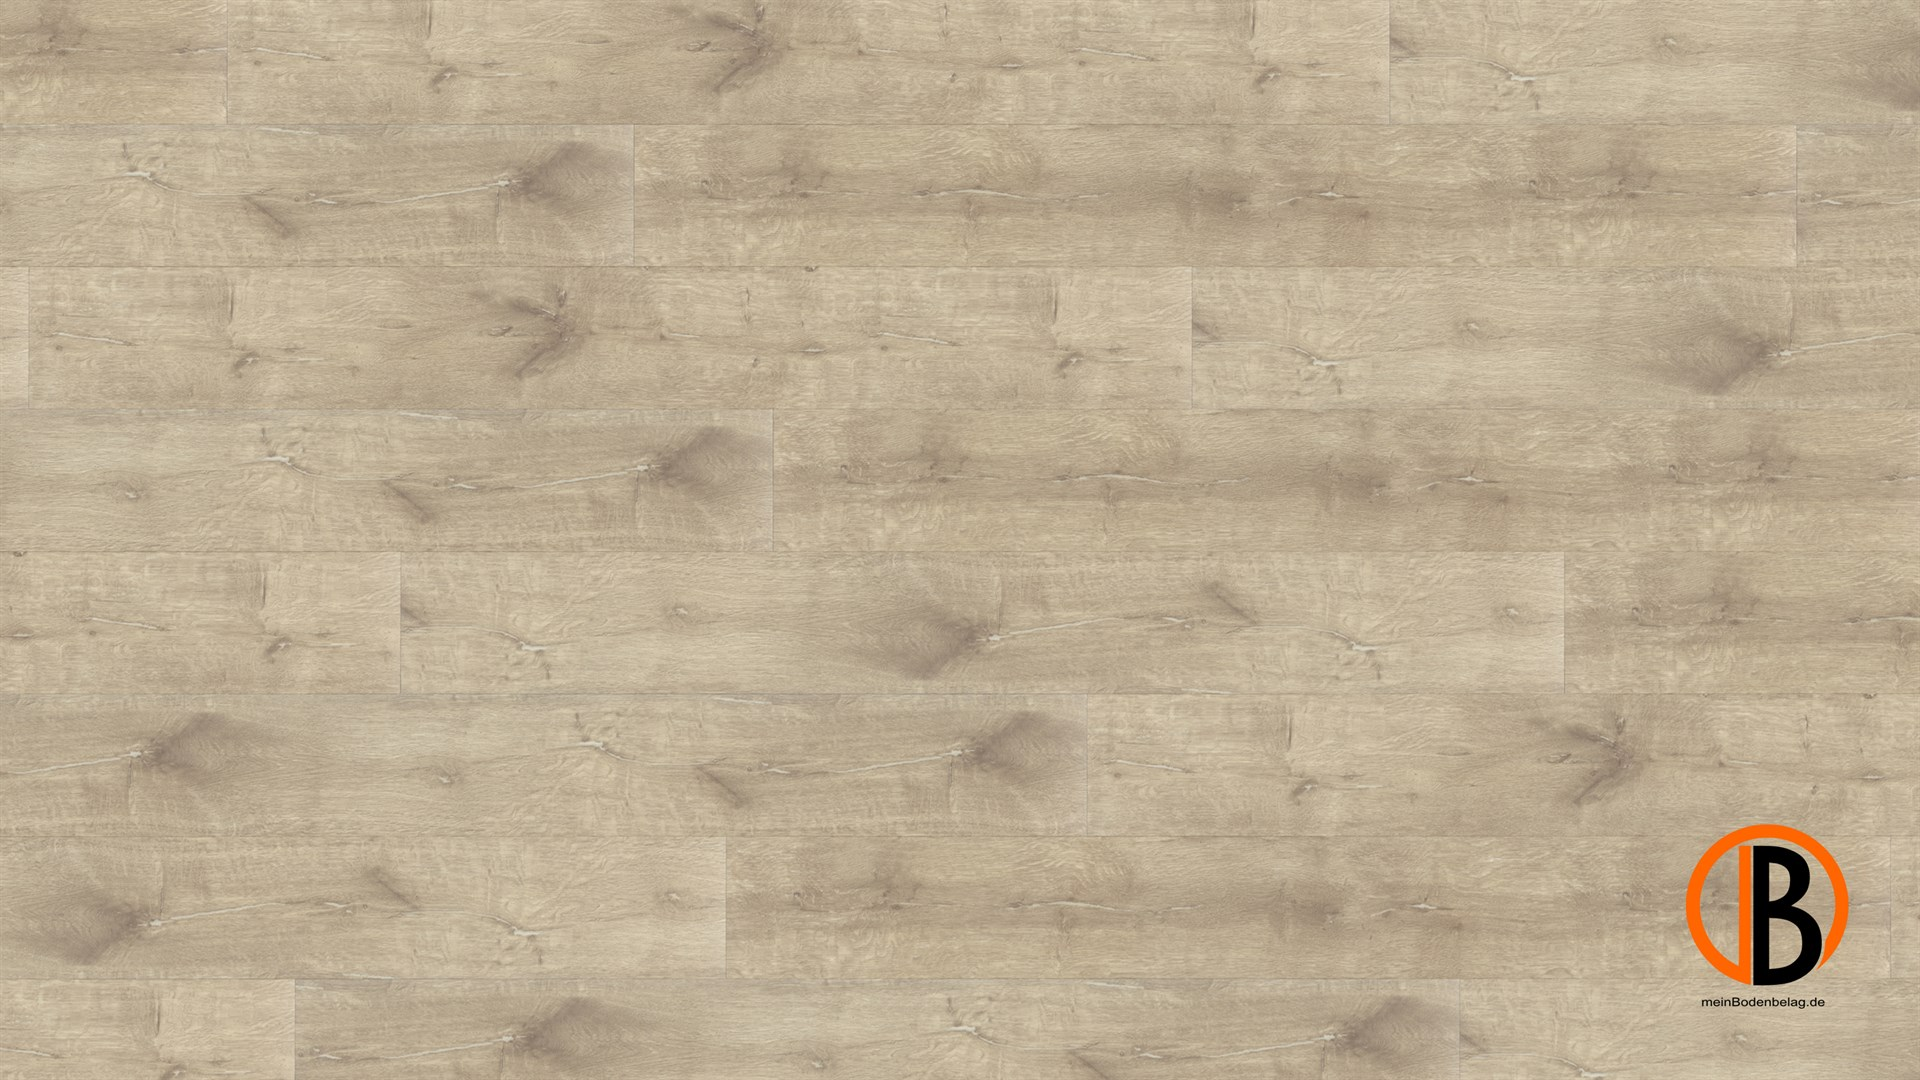 CINQUE KWG DESIGNERVINYL ANTIGUA INFINITY EXTEND SHEETS | 10000231;0 | Bild 1